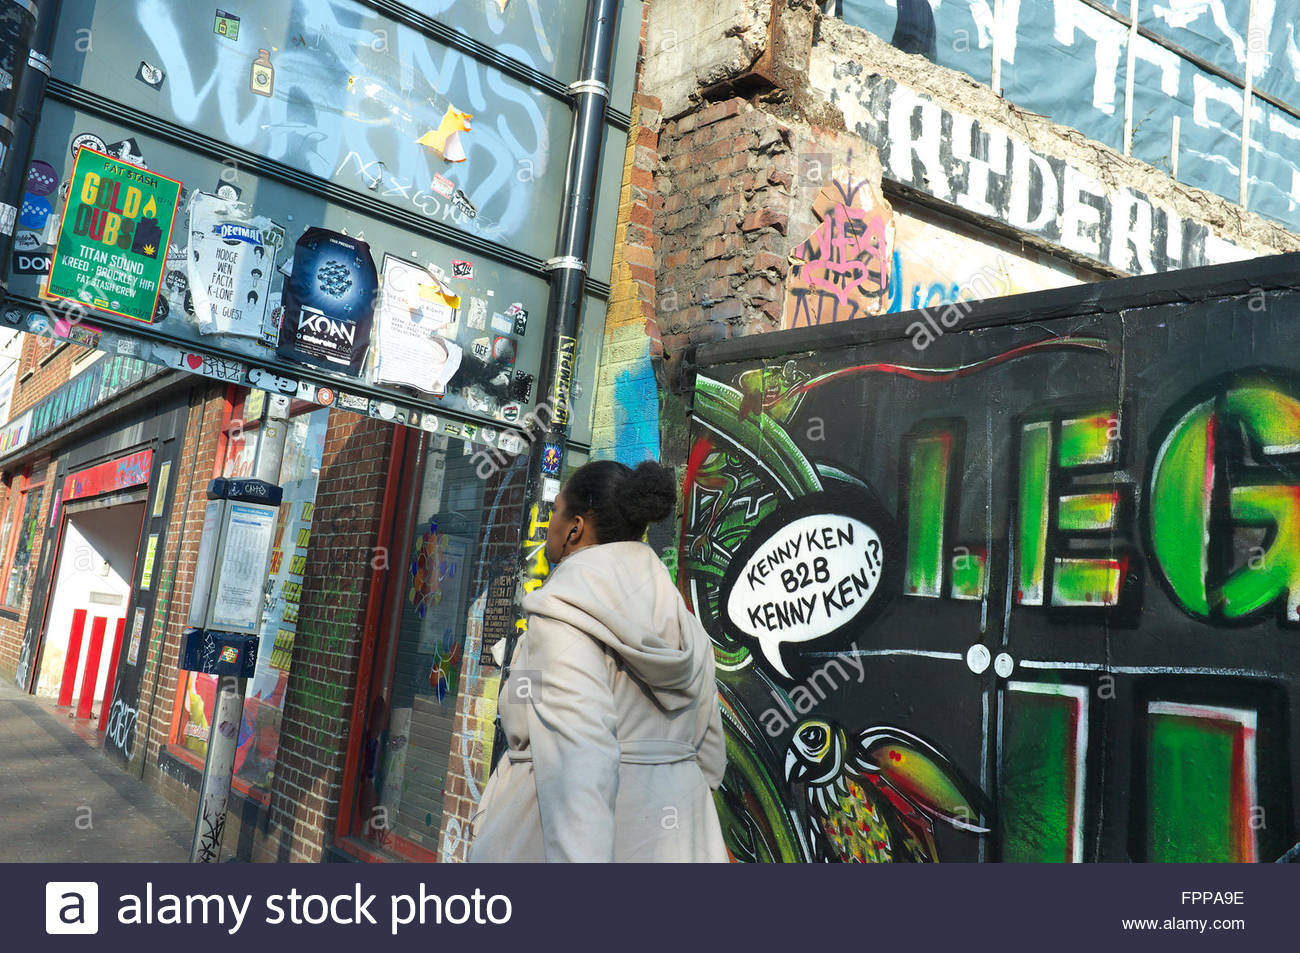 Street scene of graffiti and urban art, in Stokes Croft, Bristol, UK. - Stock Image